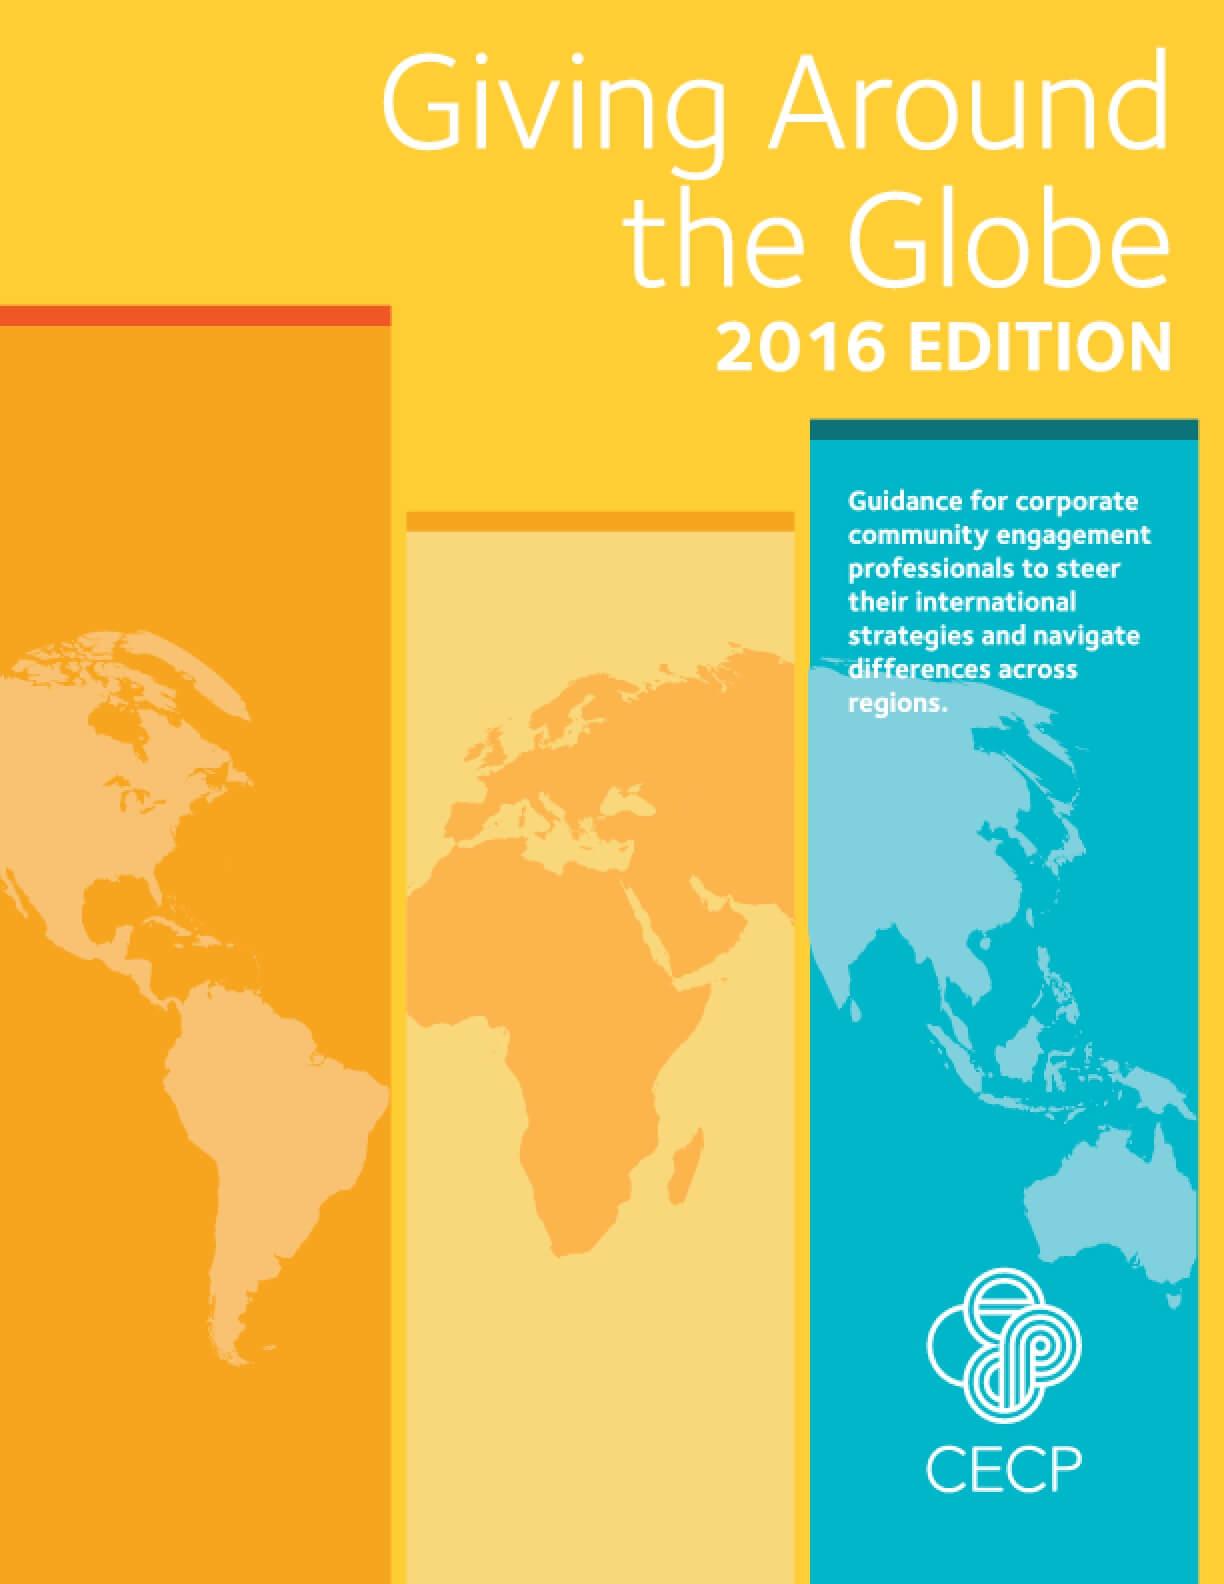 Giving Around the Globe 2016 Edition